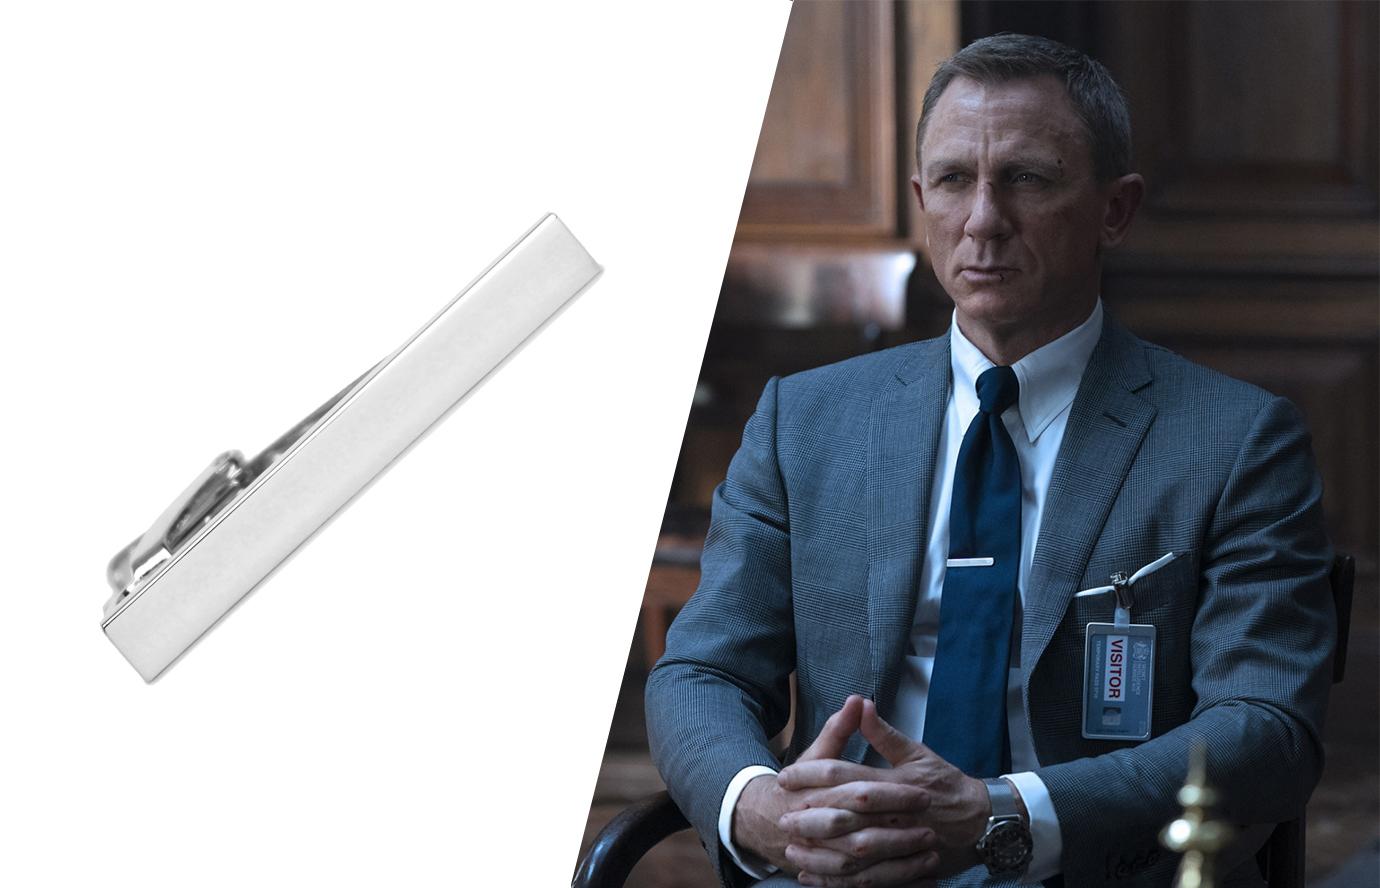 suit accessories: the tie bar